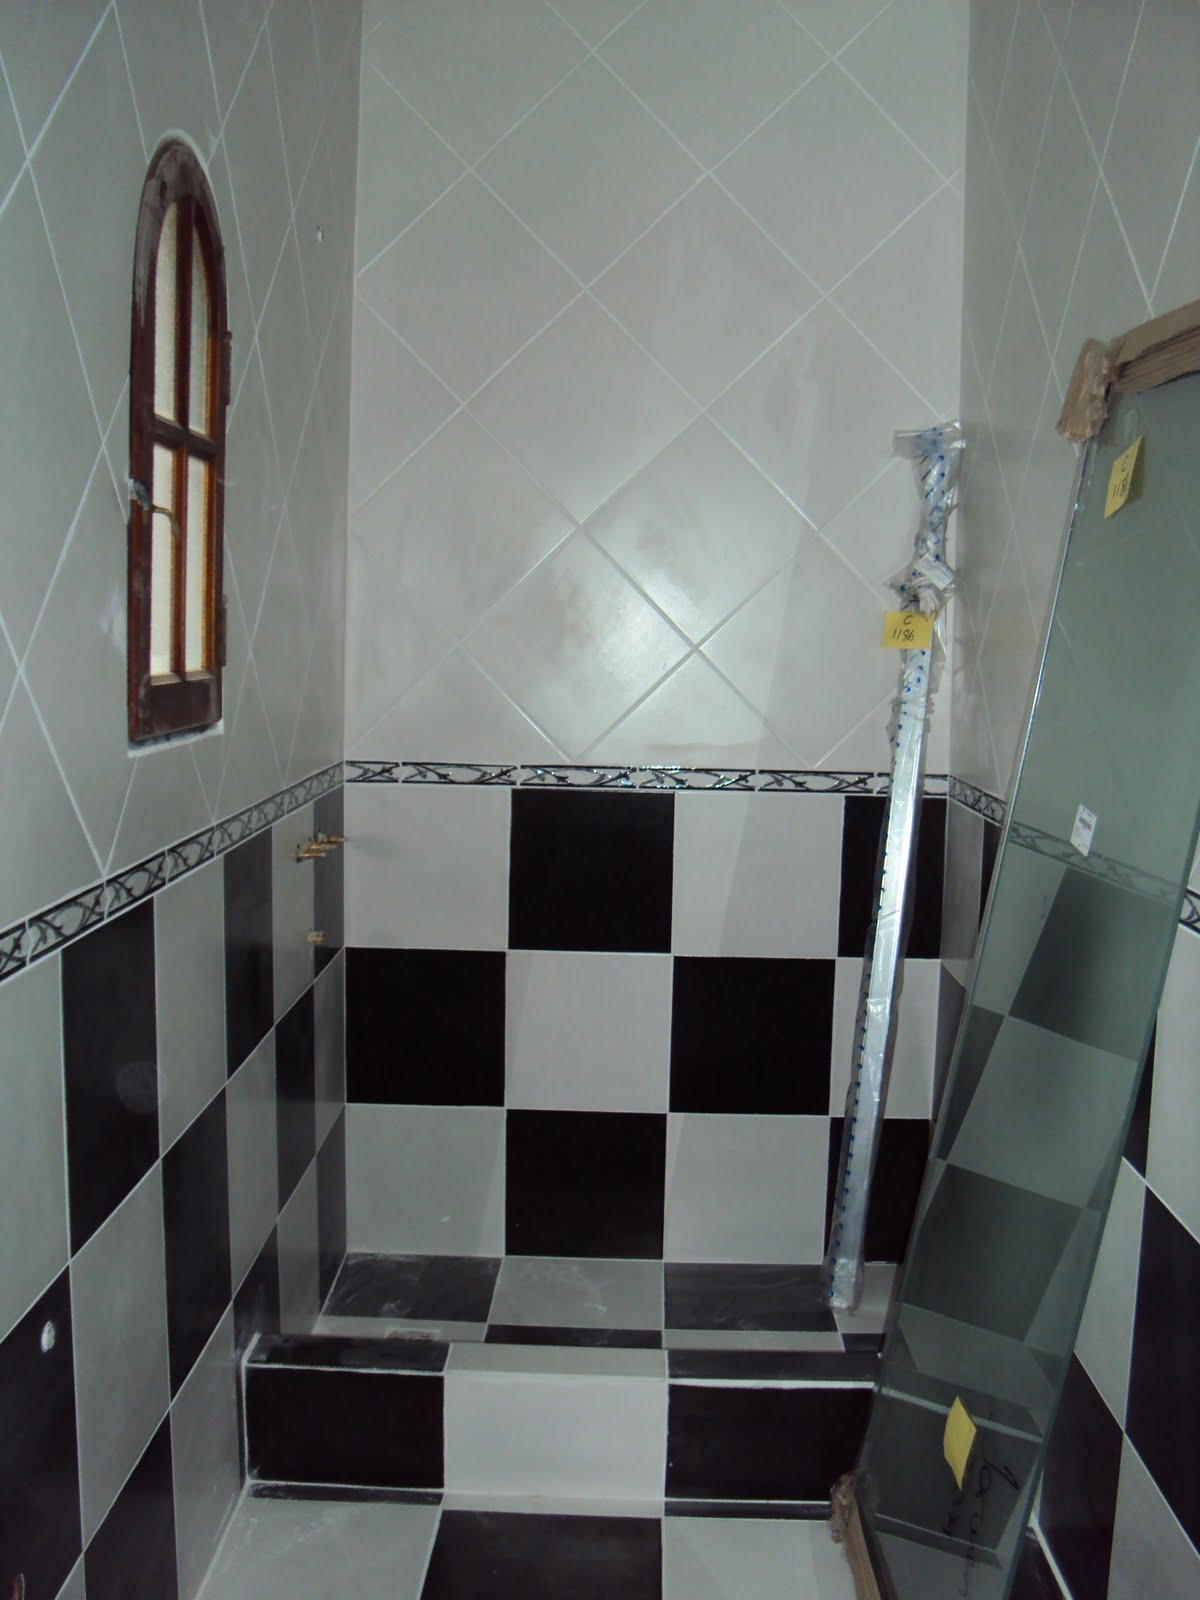 Baño Estilo Colonial:Laura Ramirez Construcciones: reforma baño estilo colonial